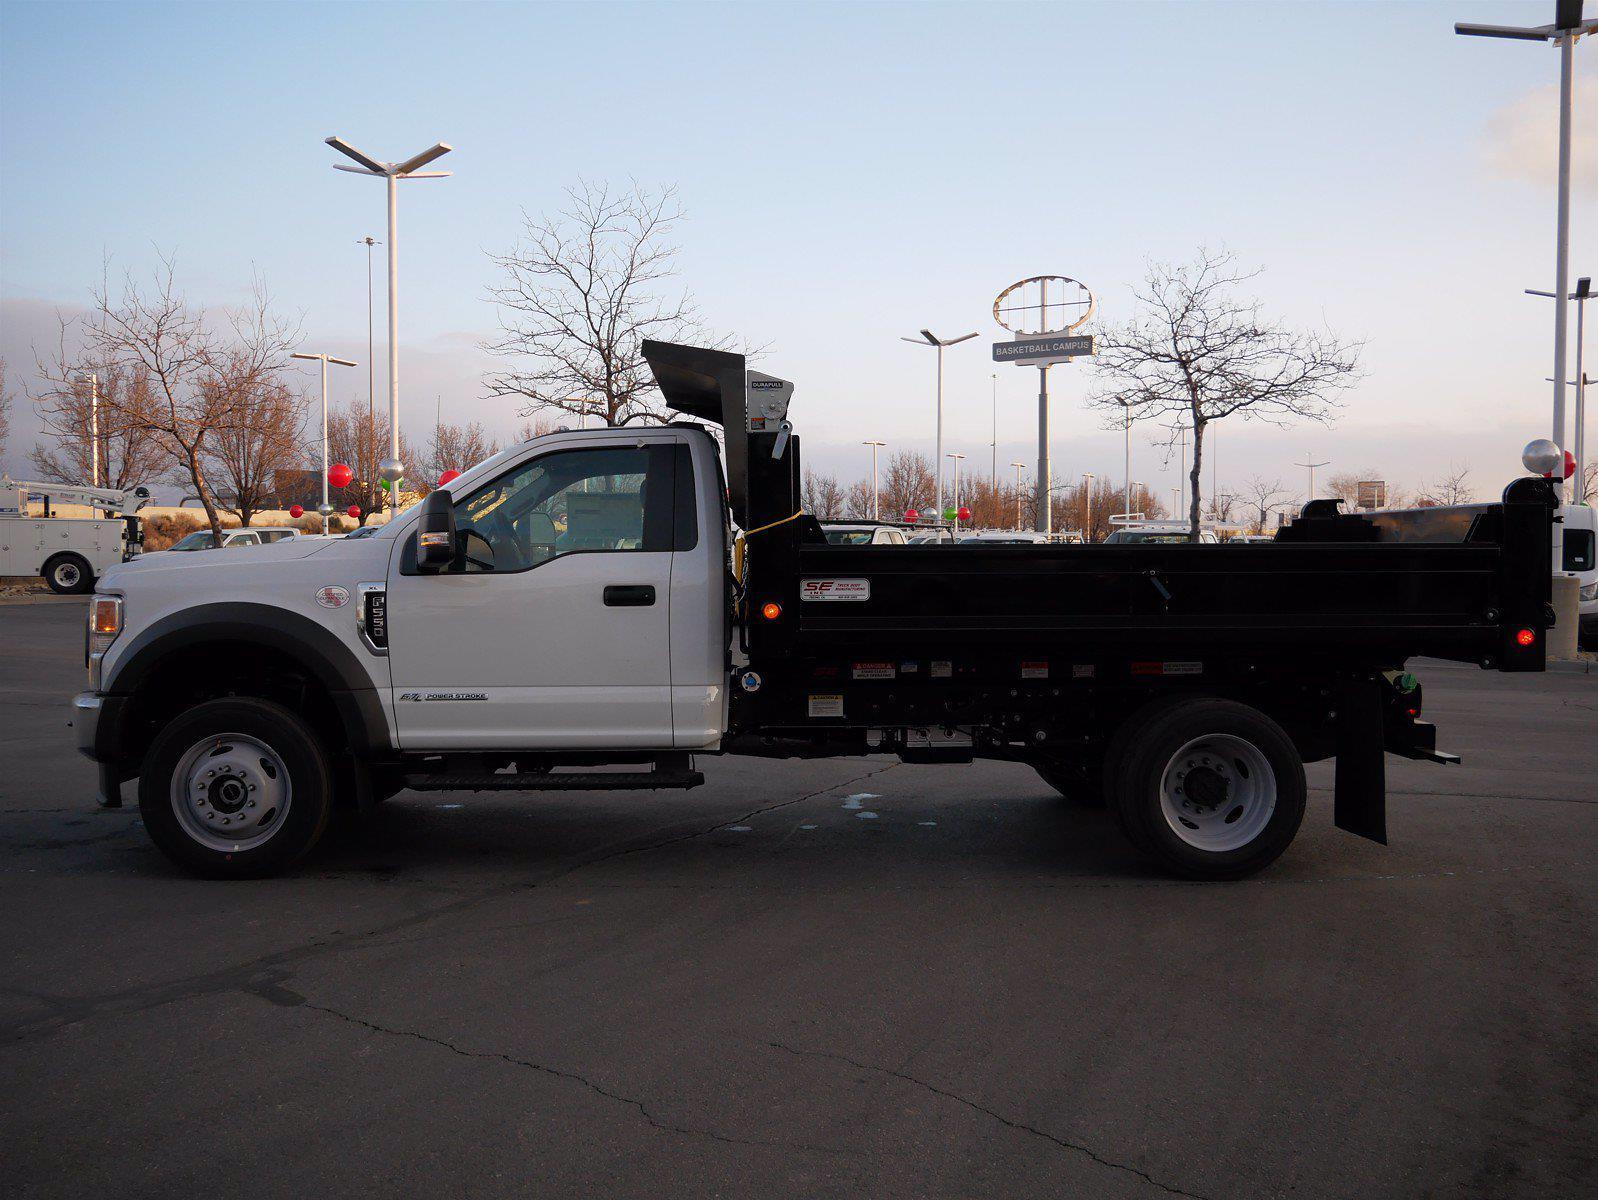 2021 Ford F-550 Regular Cab DRW 4x4, Scelzi Dump Body #64096 - photo 7